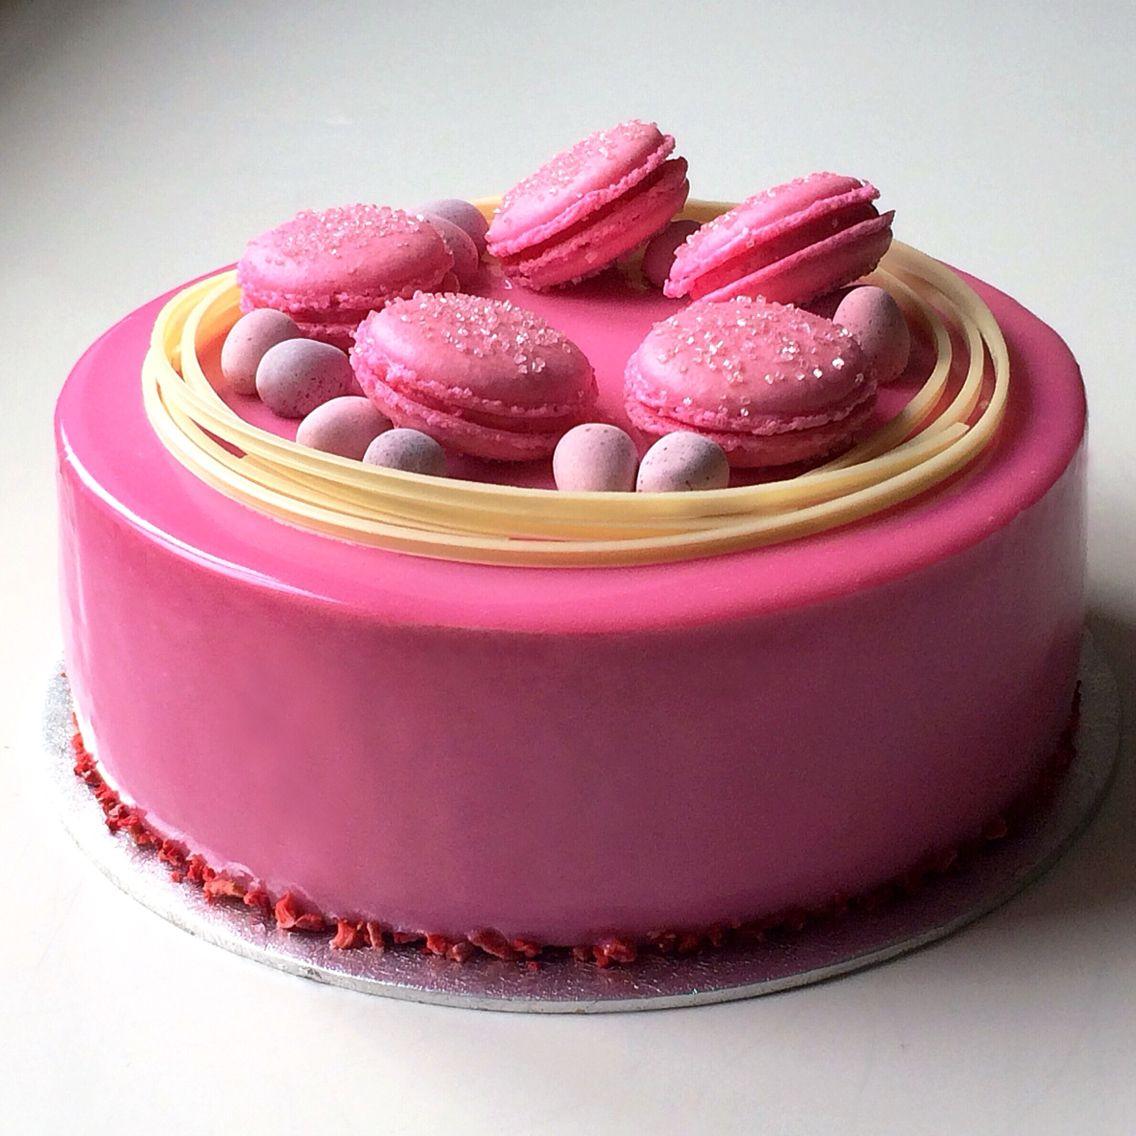 Raspberry Lemon White Chocolate Entremet Glazed Cake